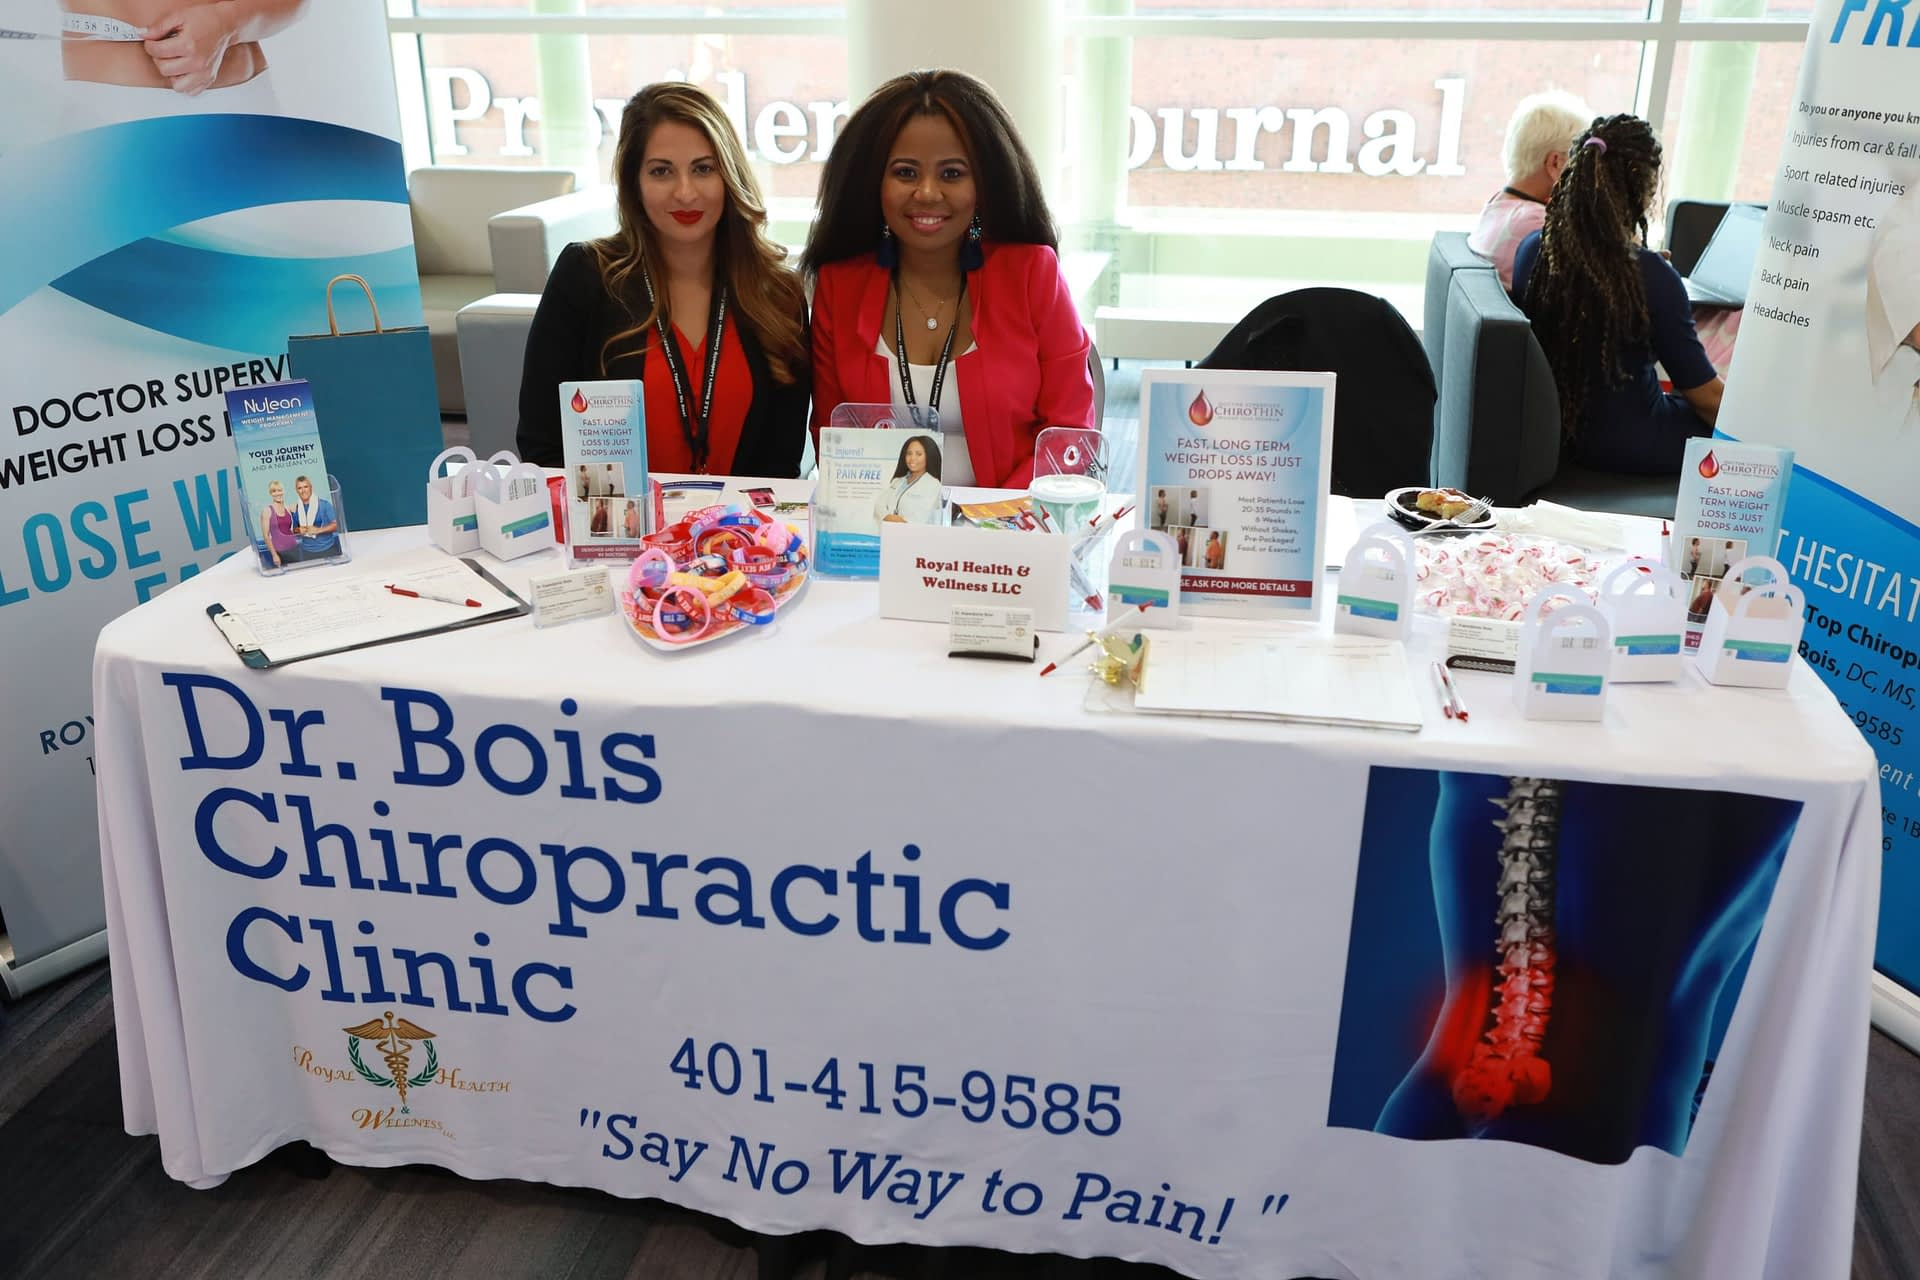 chiropractor-exhibitor